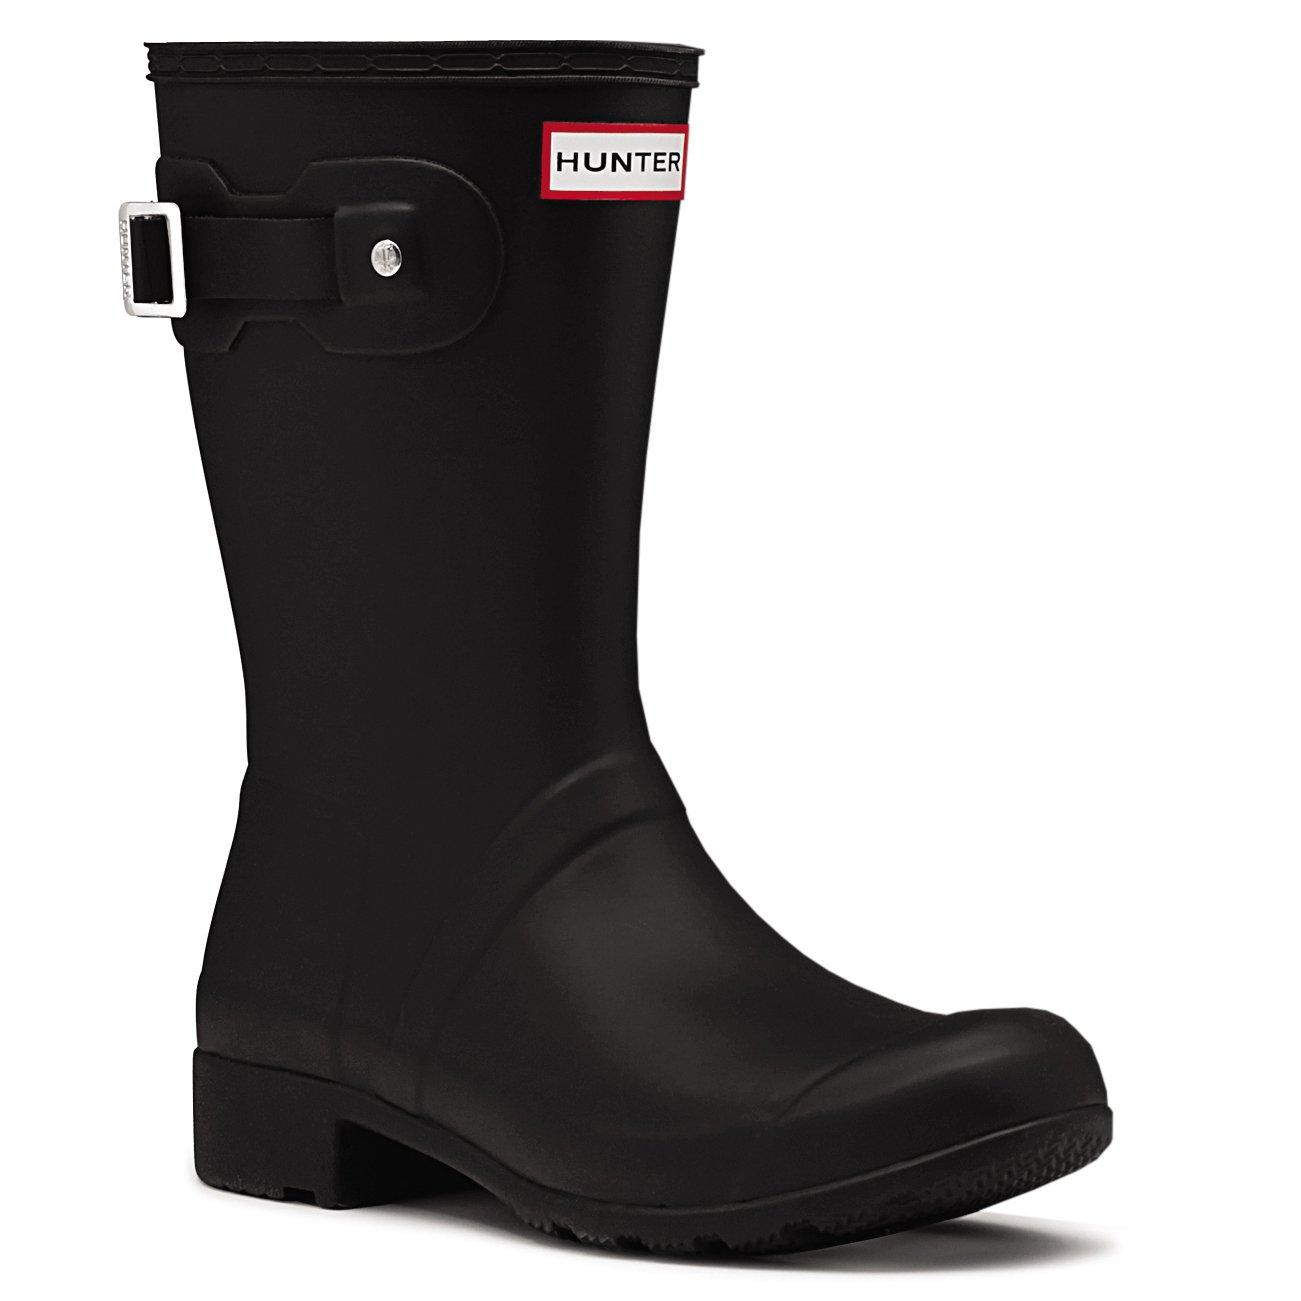 323cae1f370 Hunter Women's Original Tour Short Rain Boot